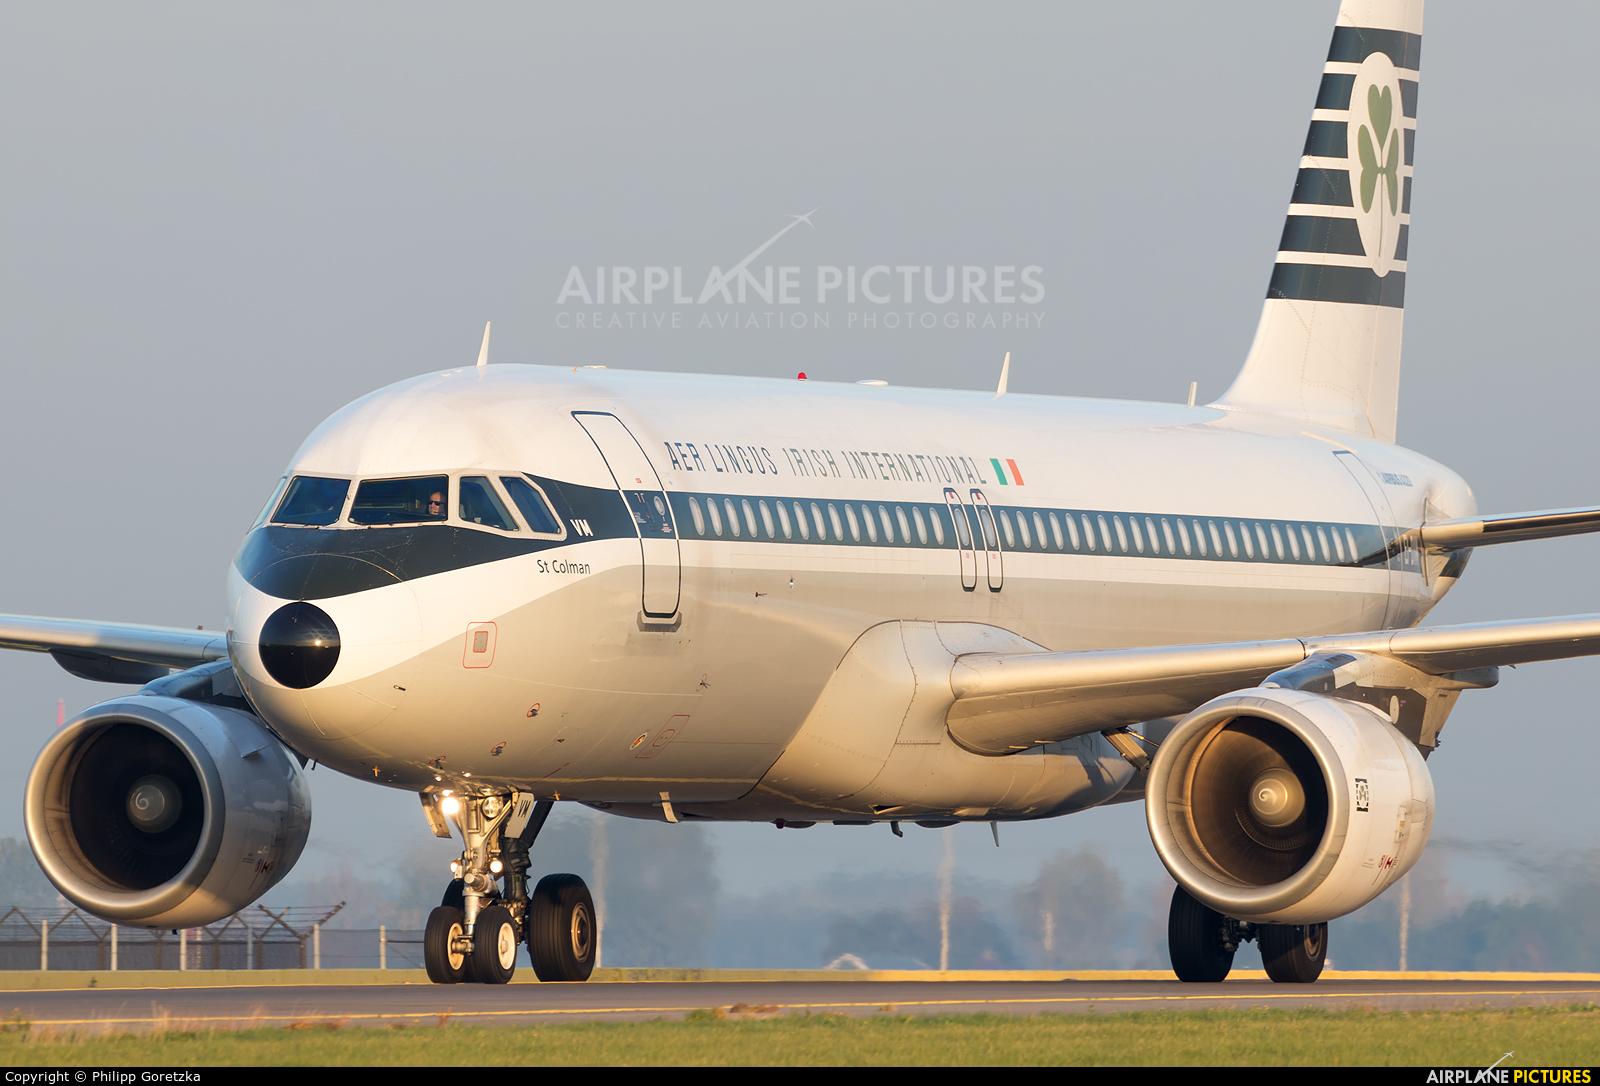 Aer Lingus EI-DVM aircraft at Amsterdam - Schiphol